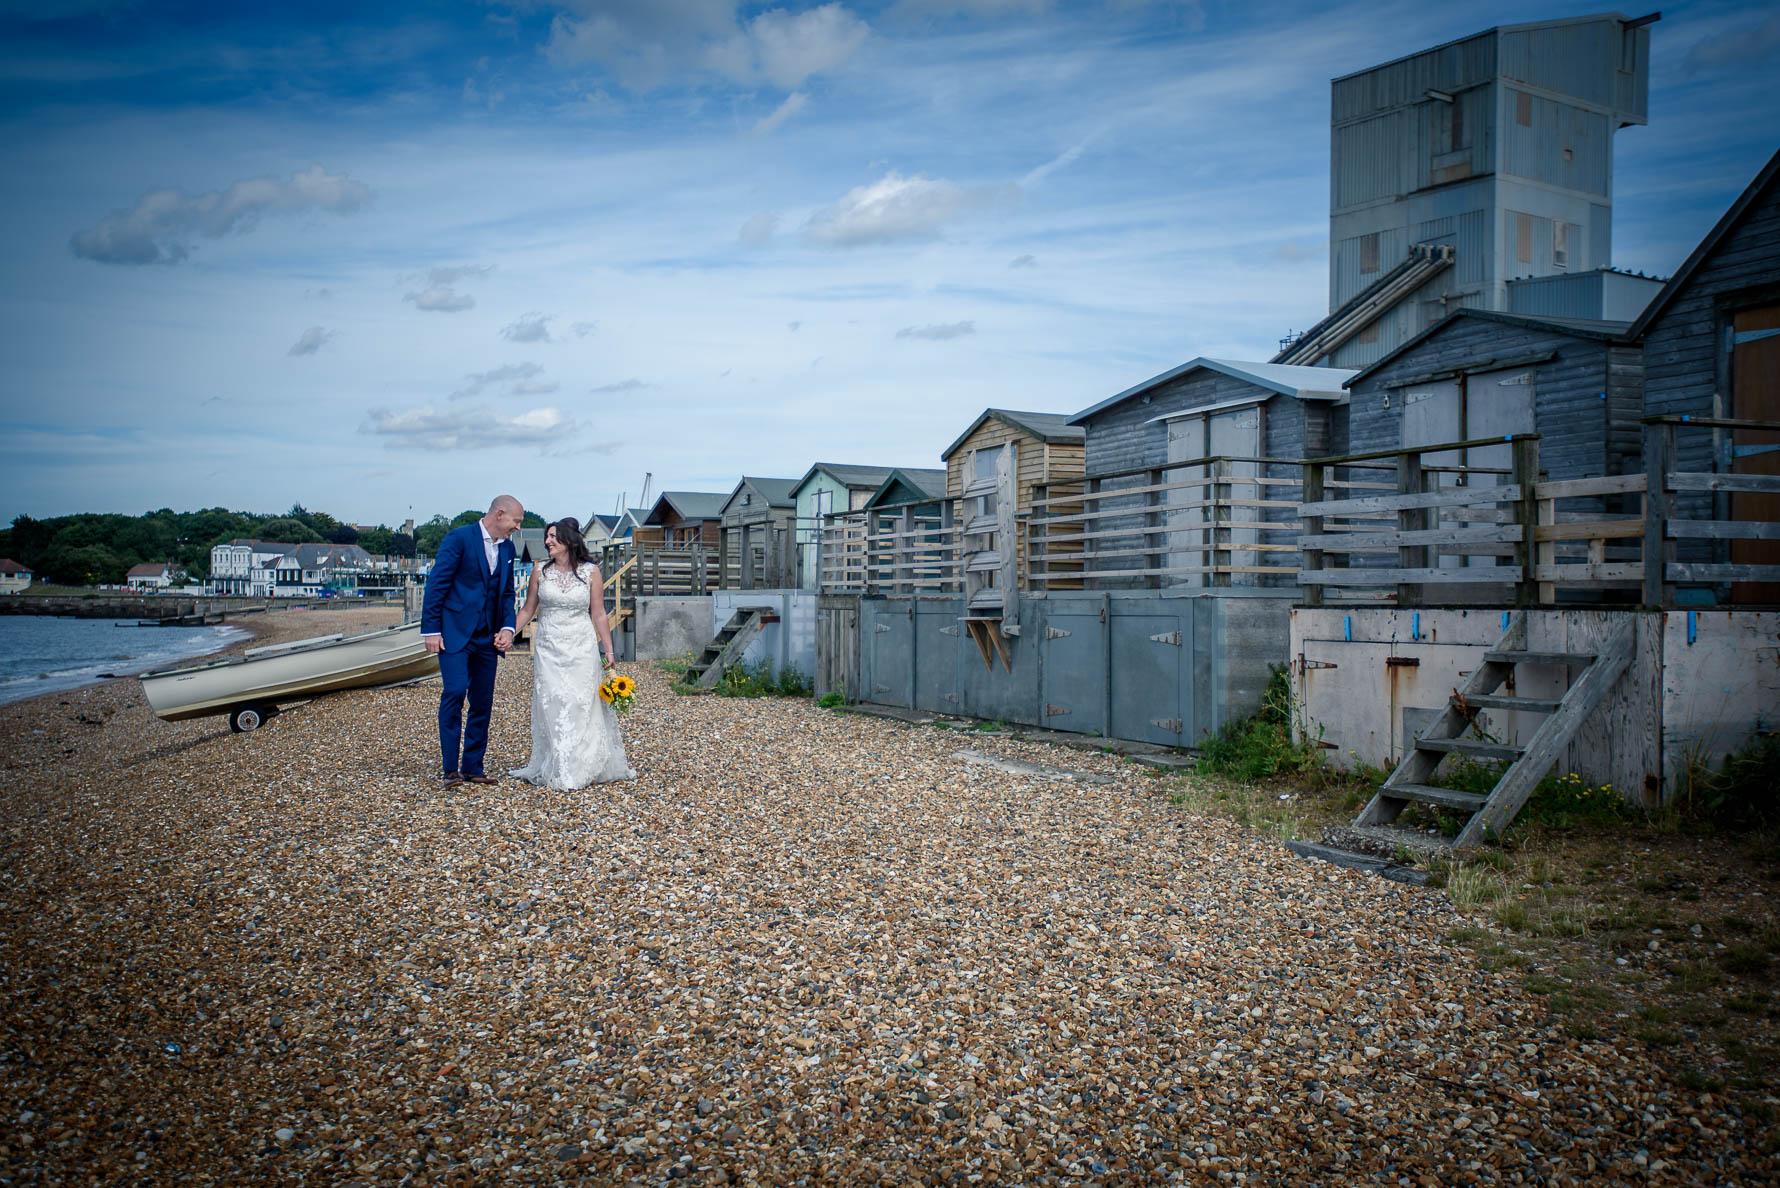 Wedding Photography at East Quay Venue-61.jpg